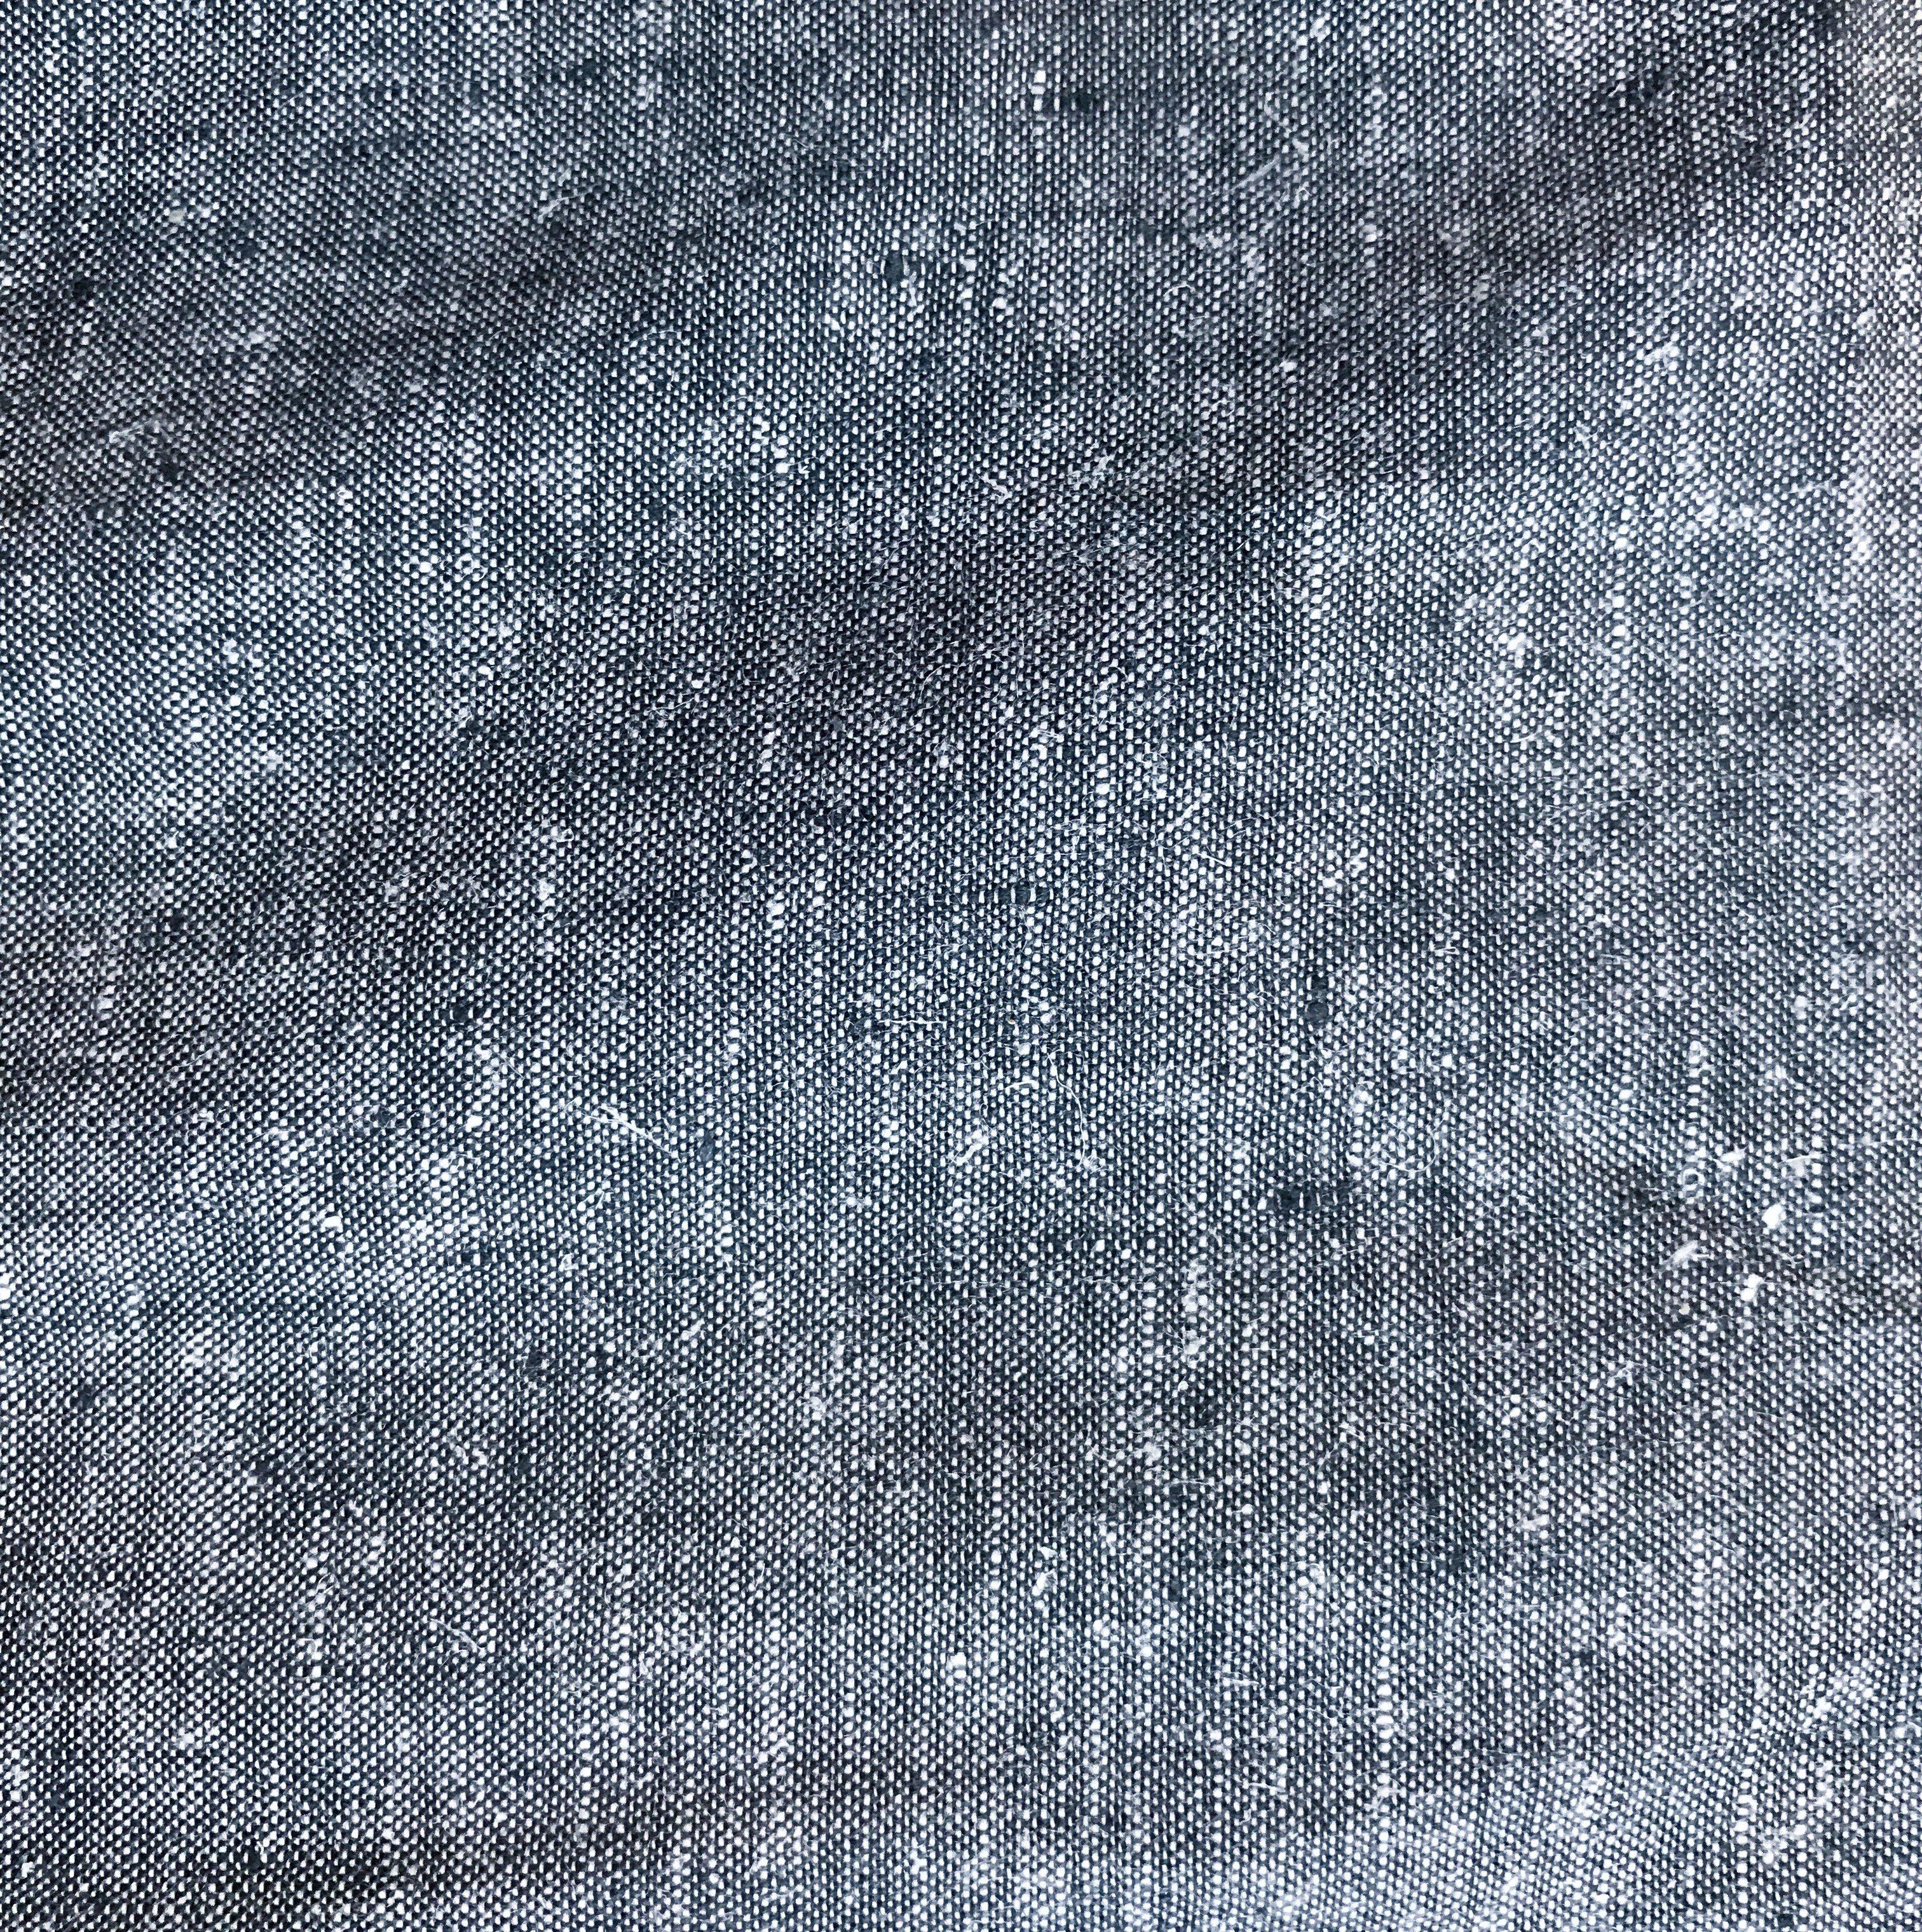 Yarn Dyed Woven Hemp/Organic Cotton Blend, HECT 01 Black